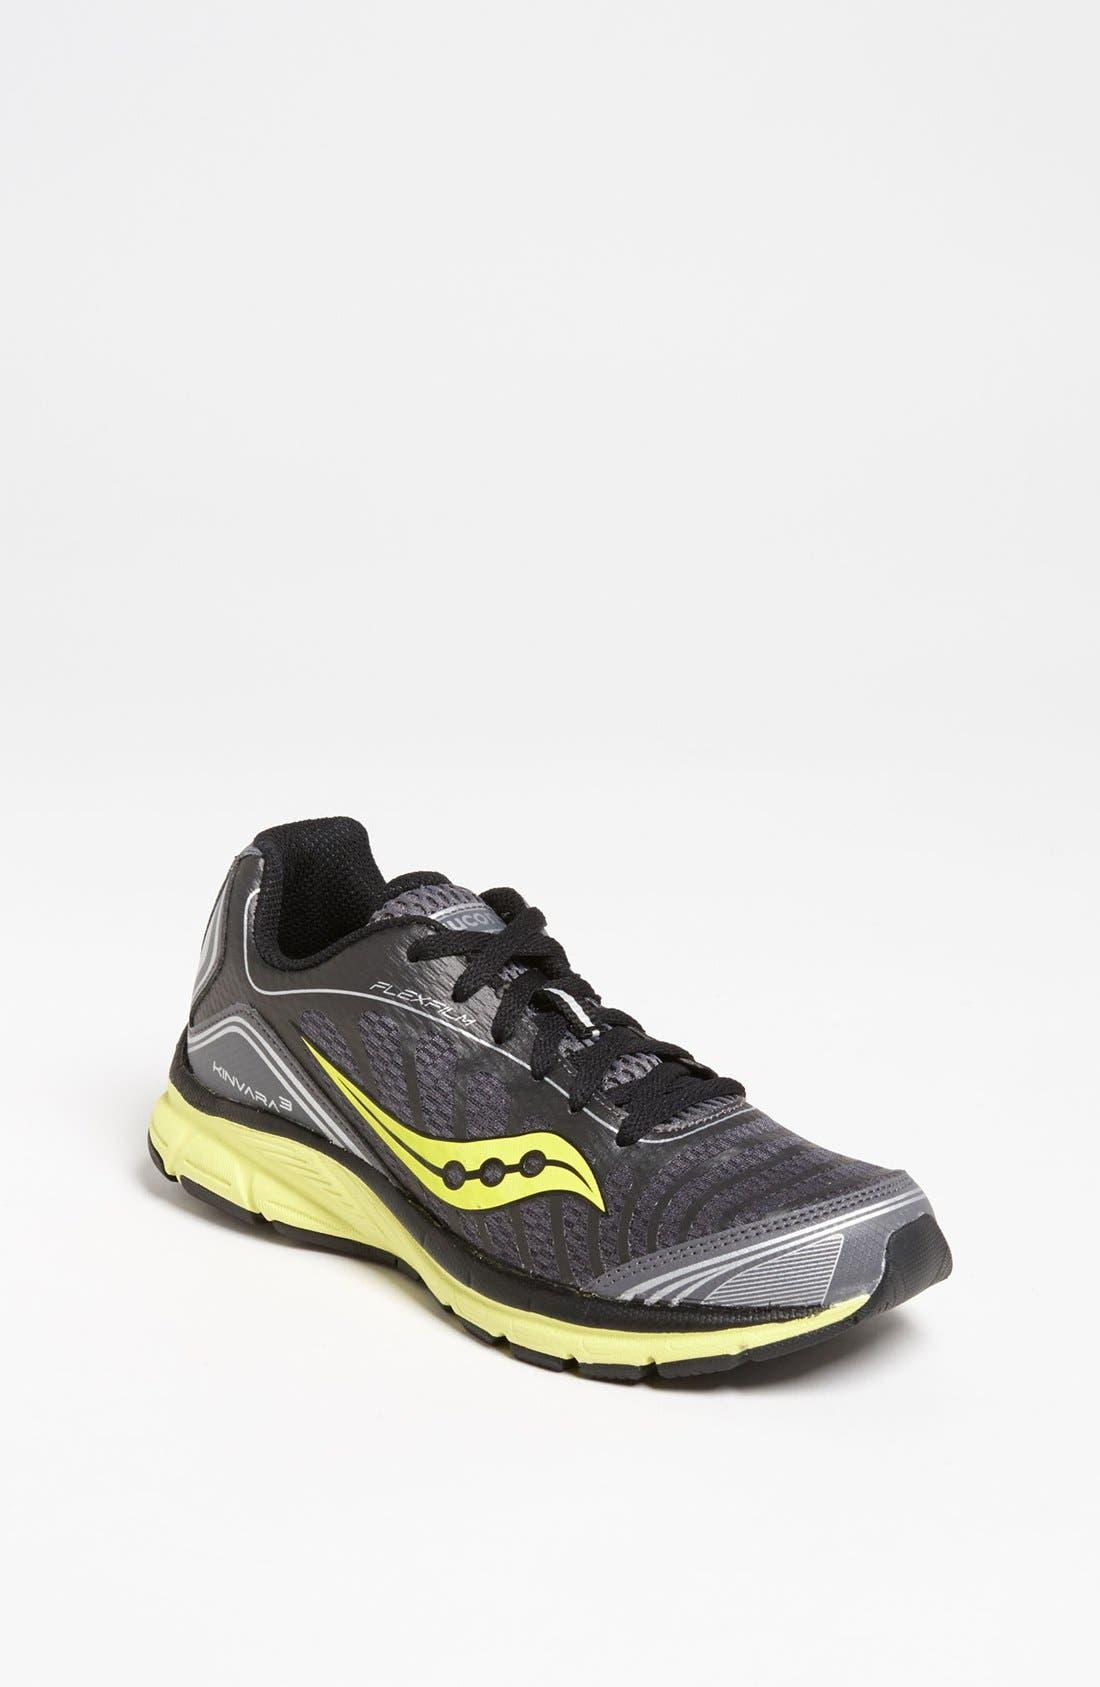 Alternate Image 1 Selected - Saucony 'Kinvara' Athletic Shoe (Toddler, Little Kid & Big Kid)